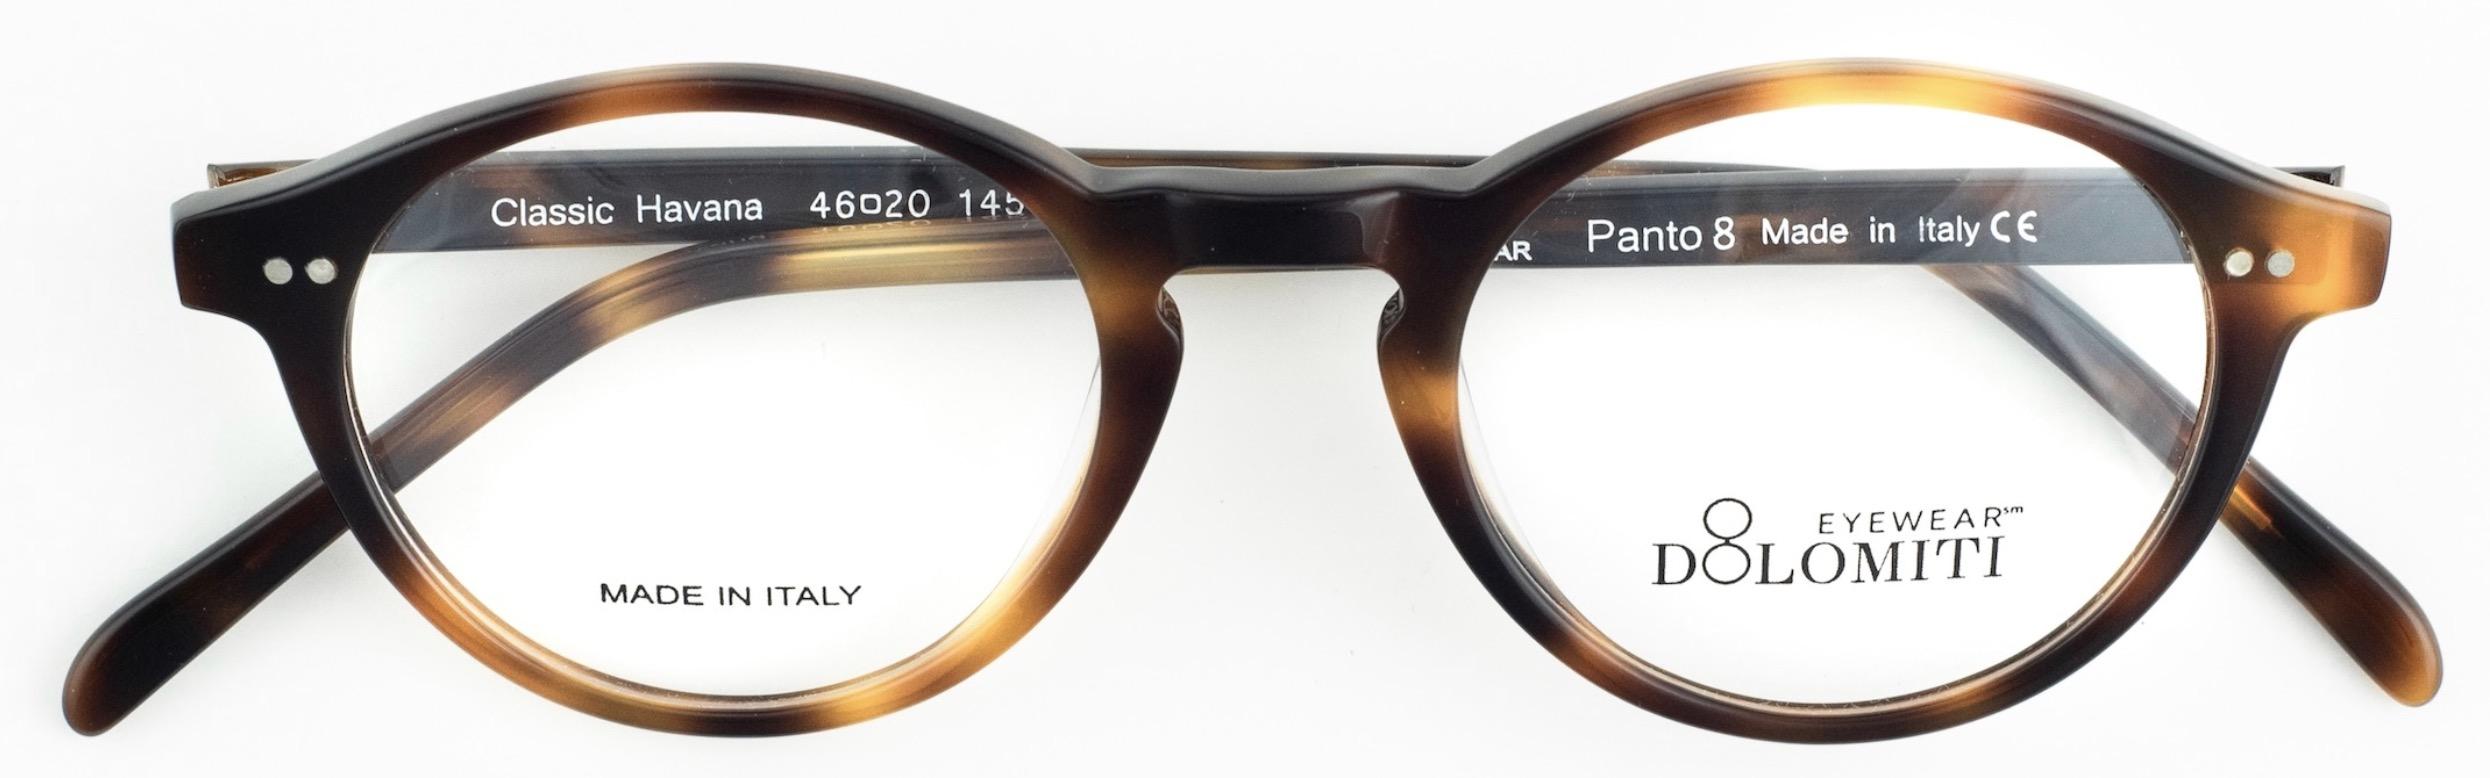 Men's Panto Oval Glasses